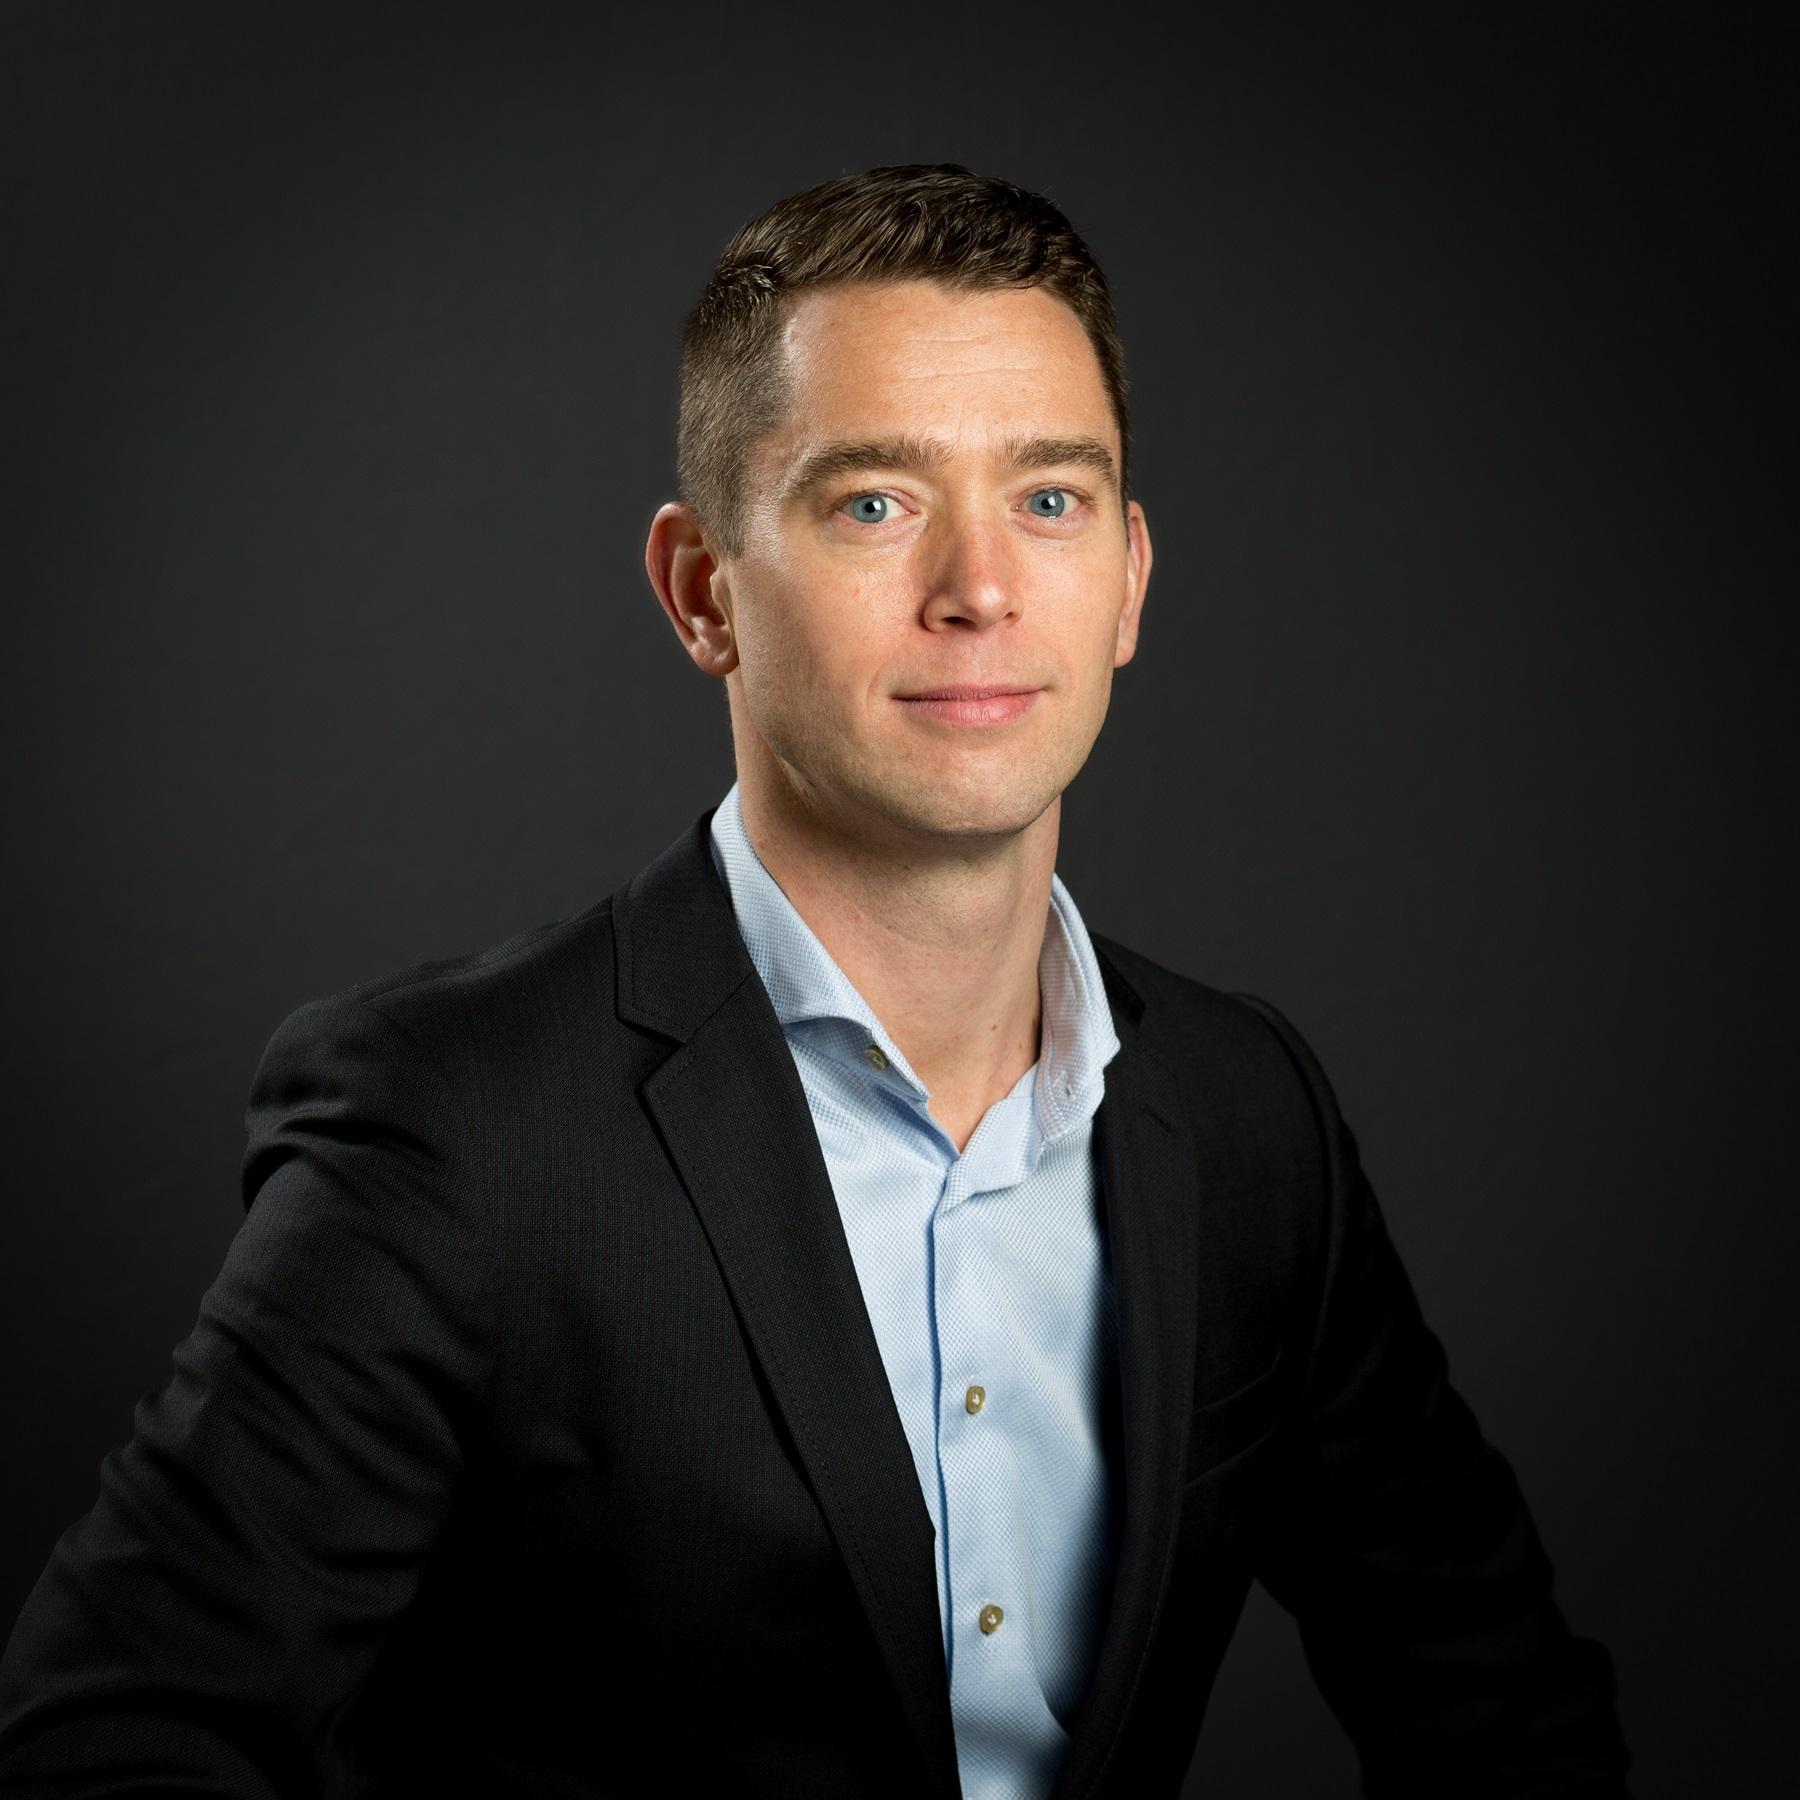 Thomas van der Knaap